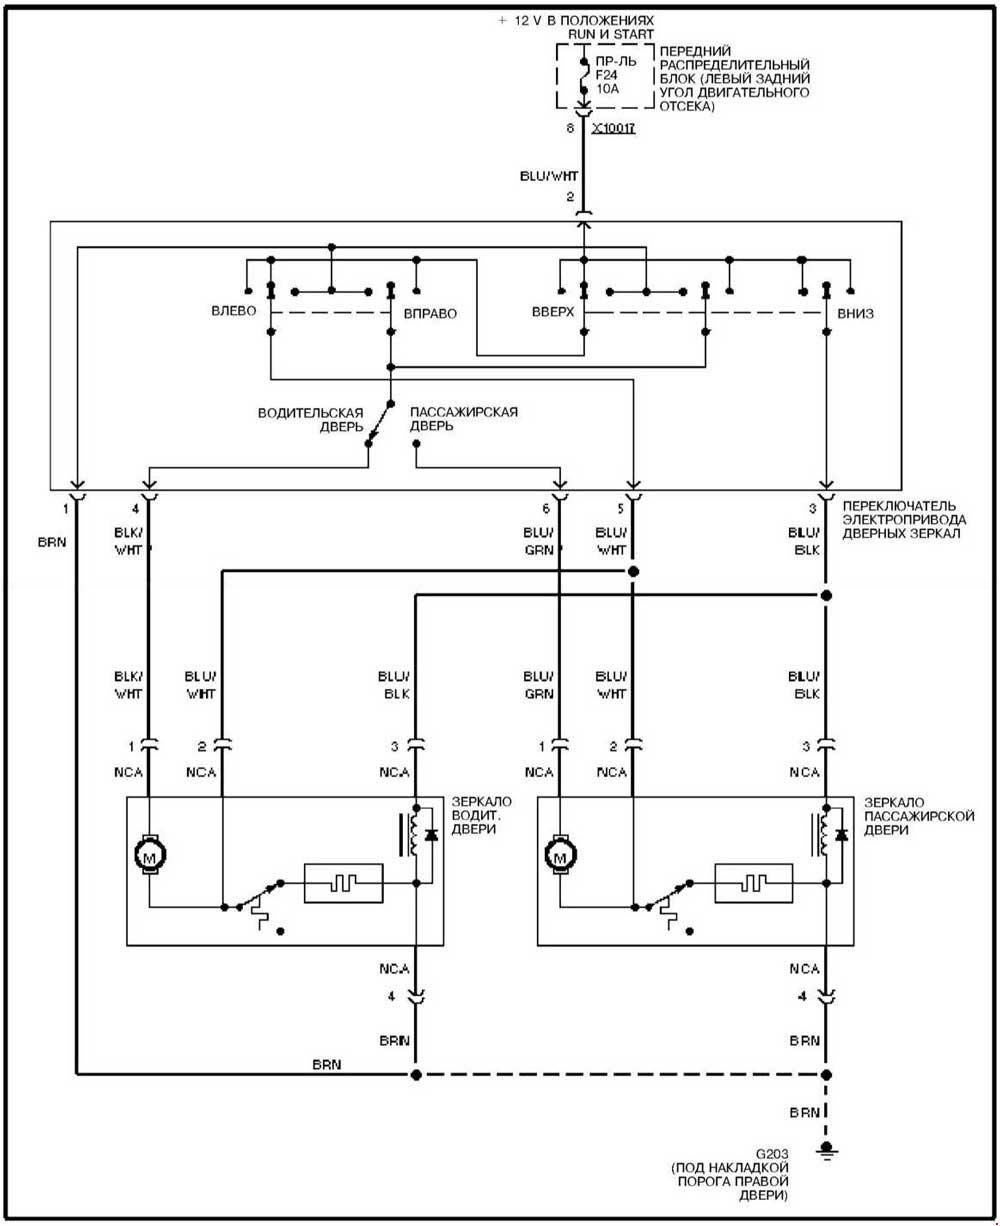 E46 Bmw Wiring Diagram from www.bimmer-service.com